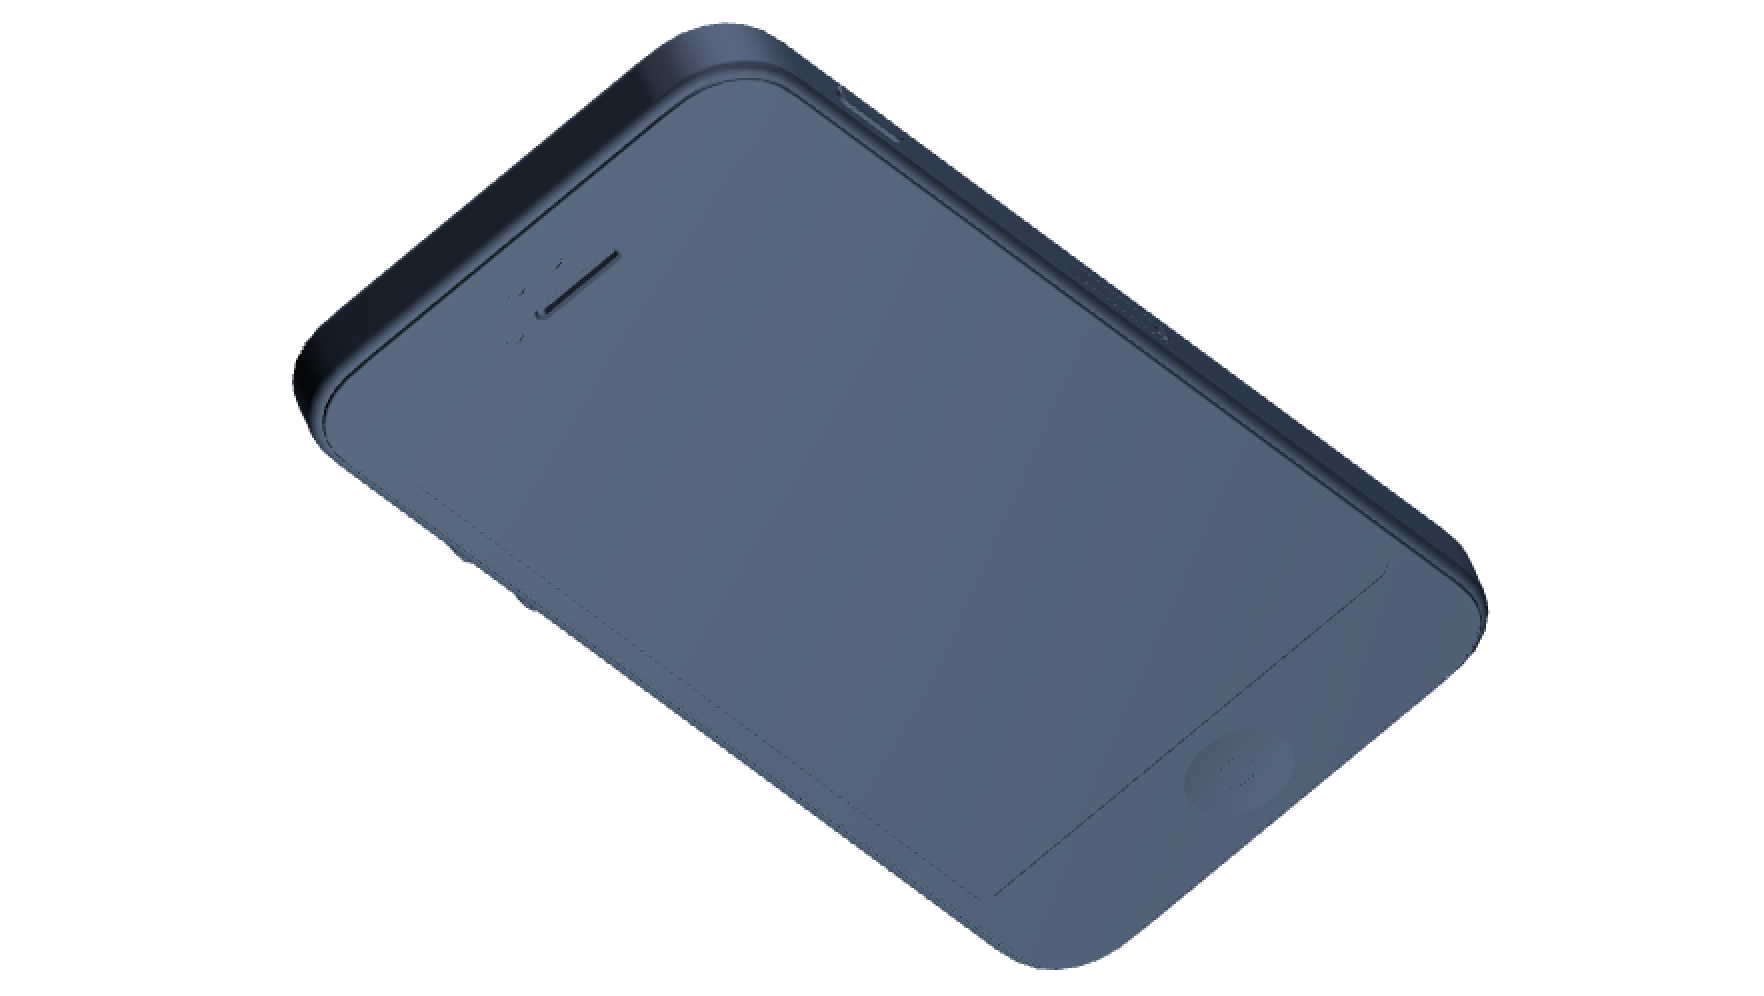 arata iPhone 5se - iDevice.ro